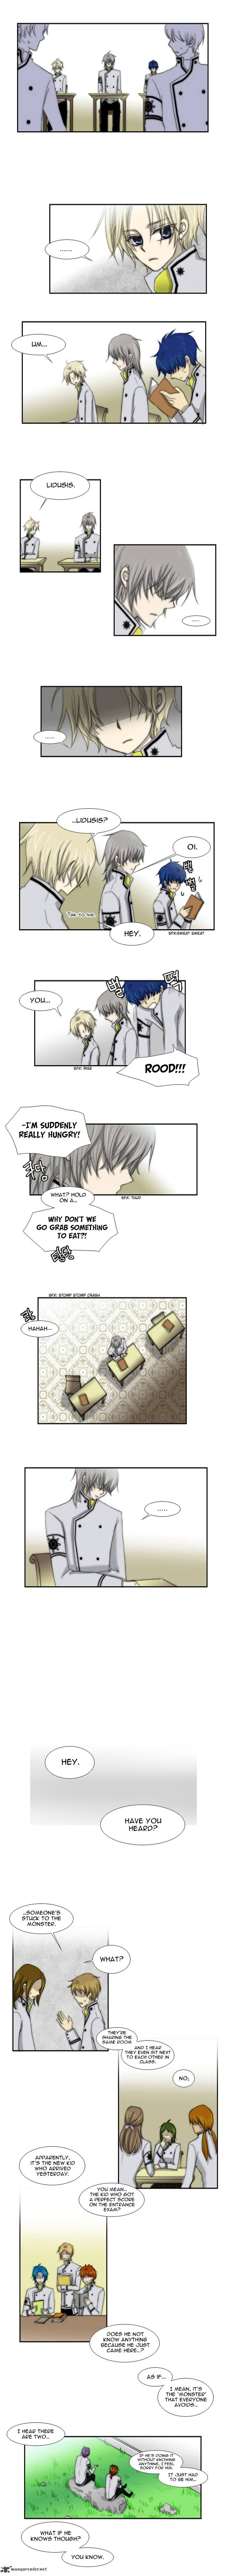 Black Haze 16 Page 2